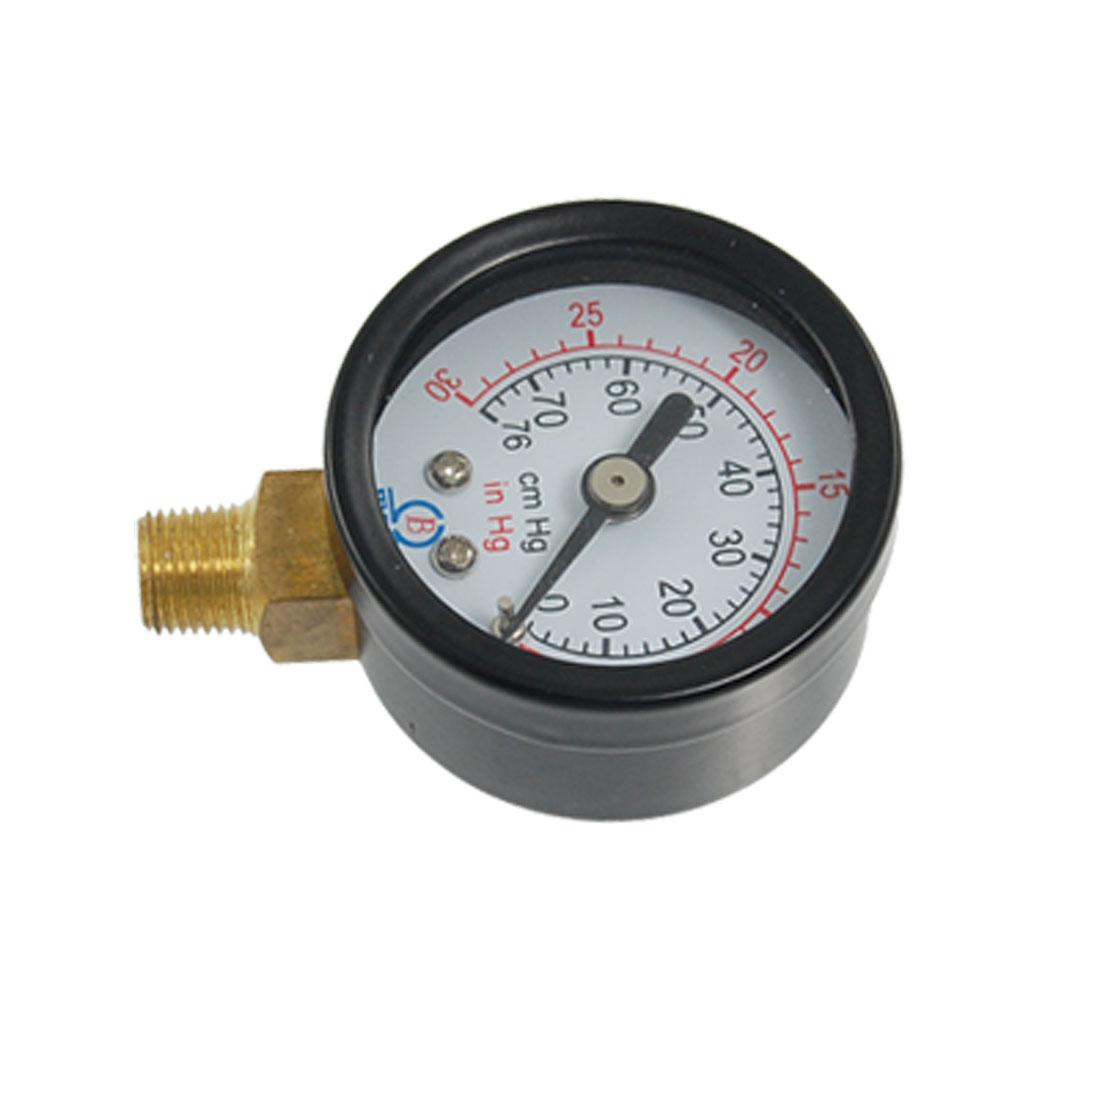 "-30/0Hg 0.35"" Male Threaded Pneumatic Air Vacuum Pressure Gauge"